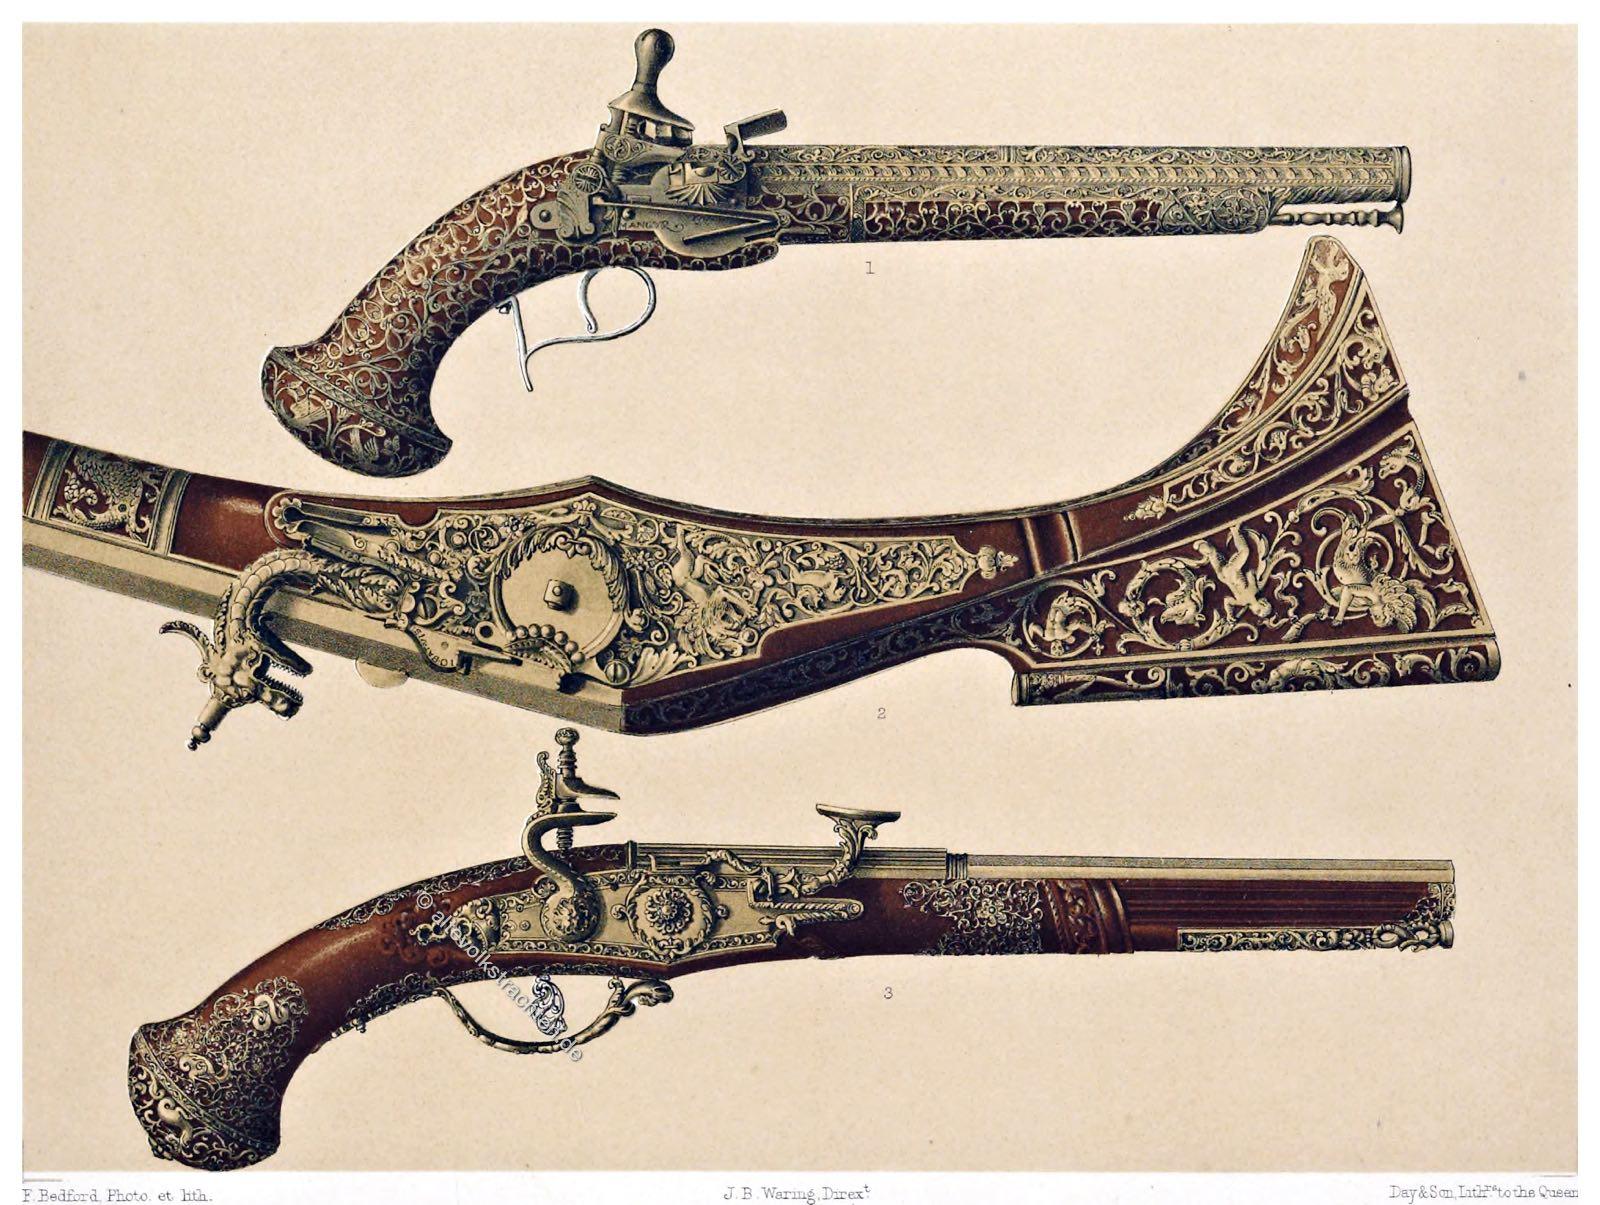 Lazzarino Cominazzo, Pistolen, Duell, Barock, Italien, Waffenkunst